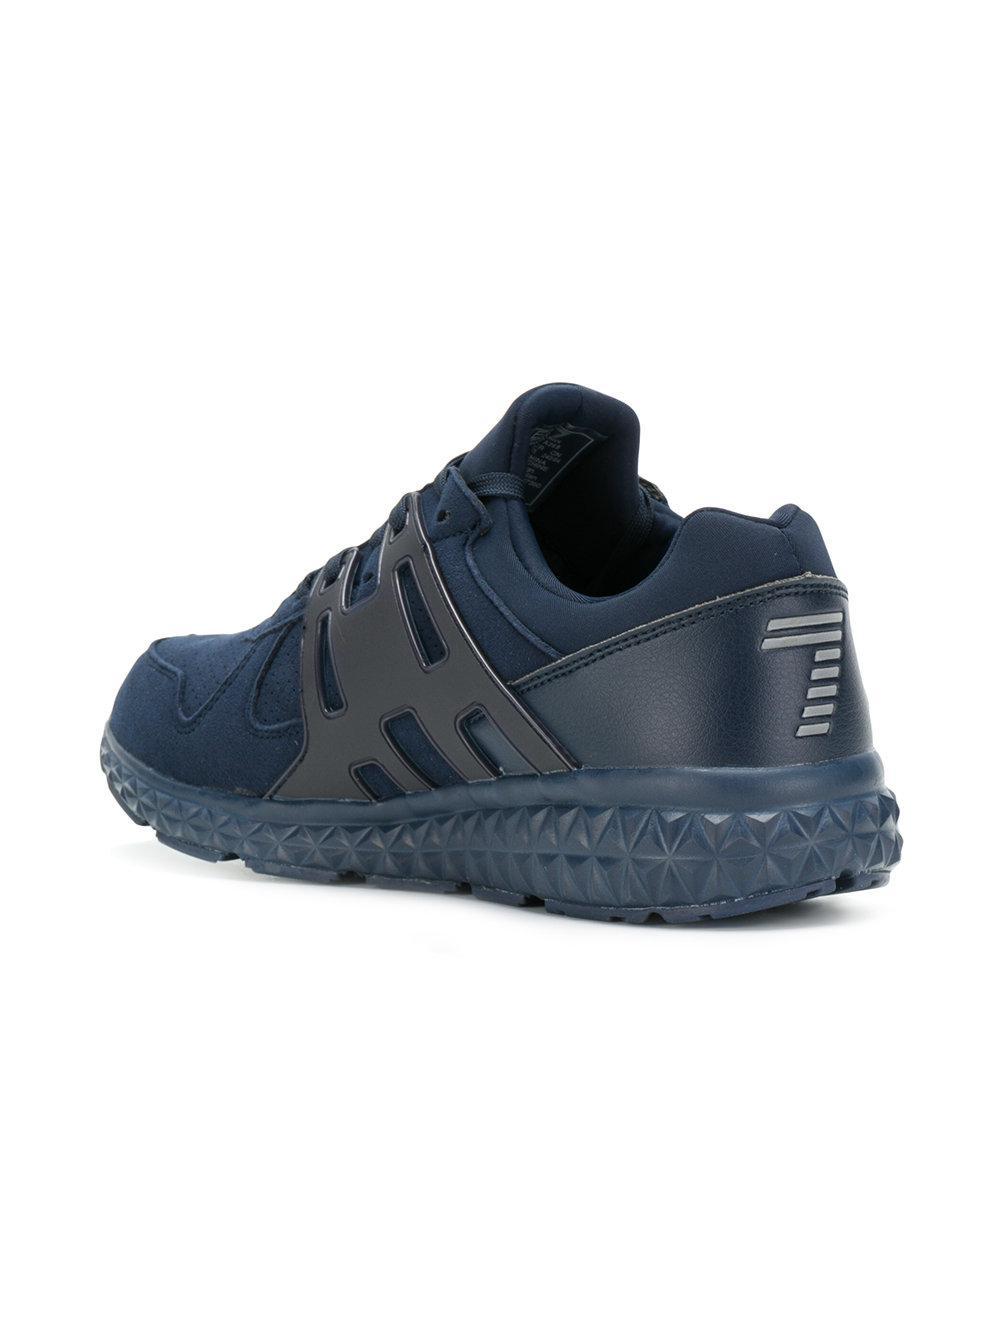 EA7 Synthetic C2 Light Sneakers in Blue